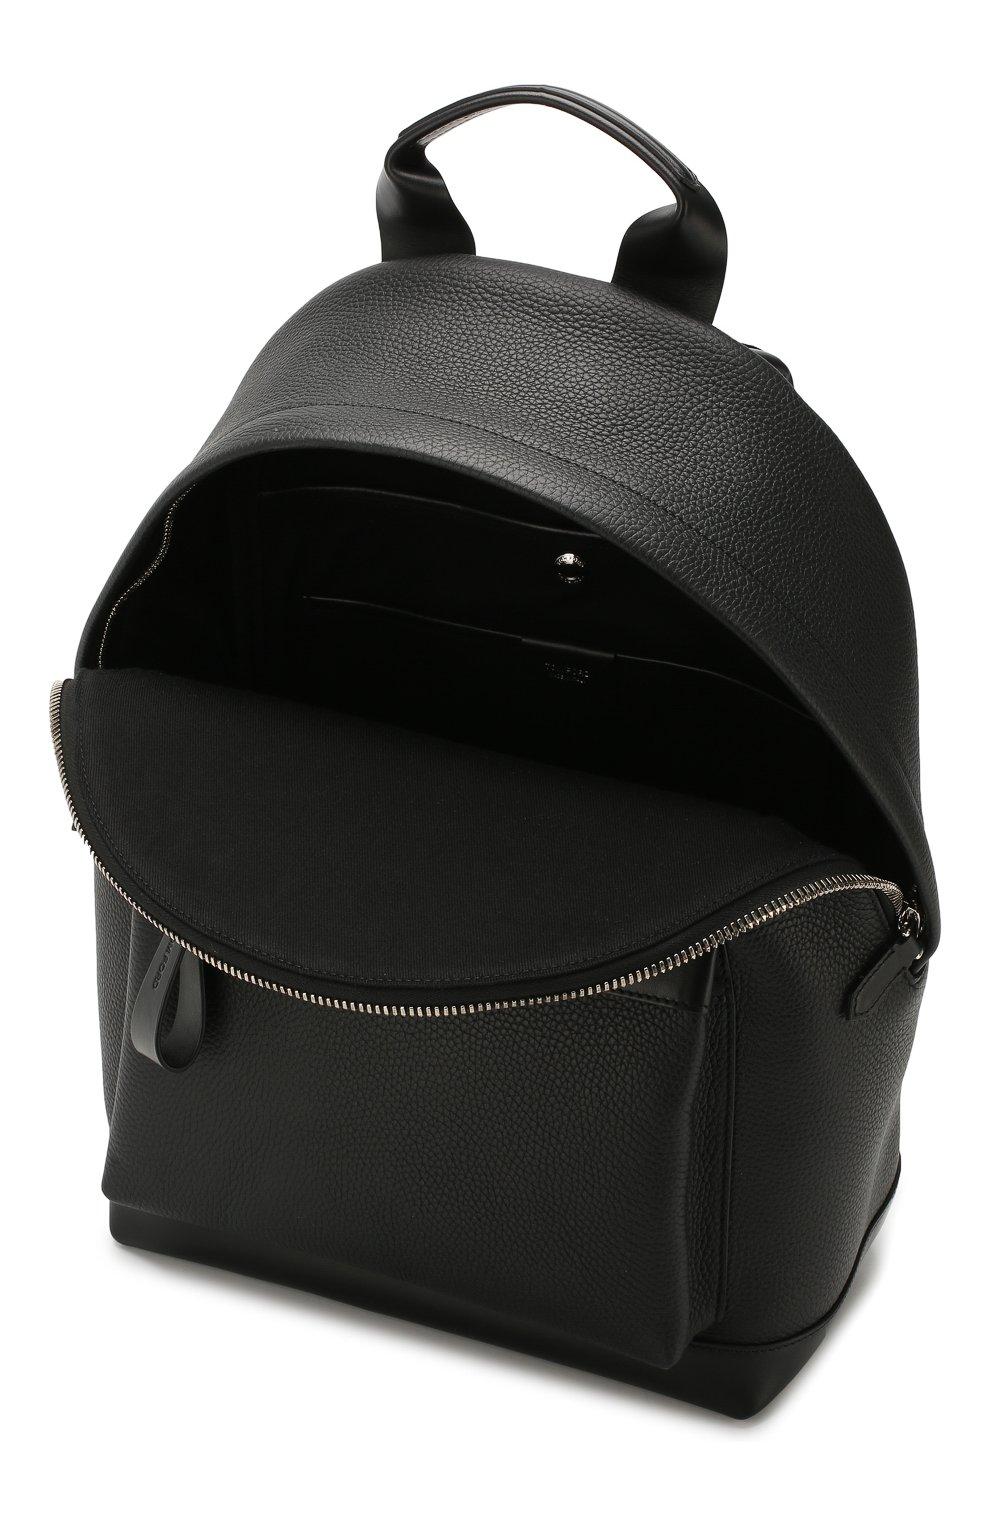 Мужской кожаный рюкзак TOM FORD черного цвета, арт. H0397P-LCL037 | Фото 4